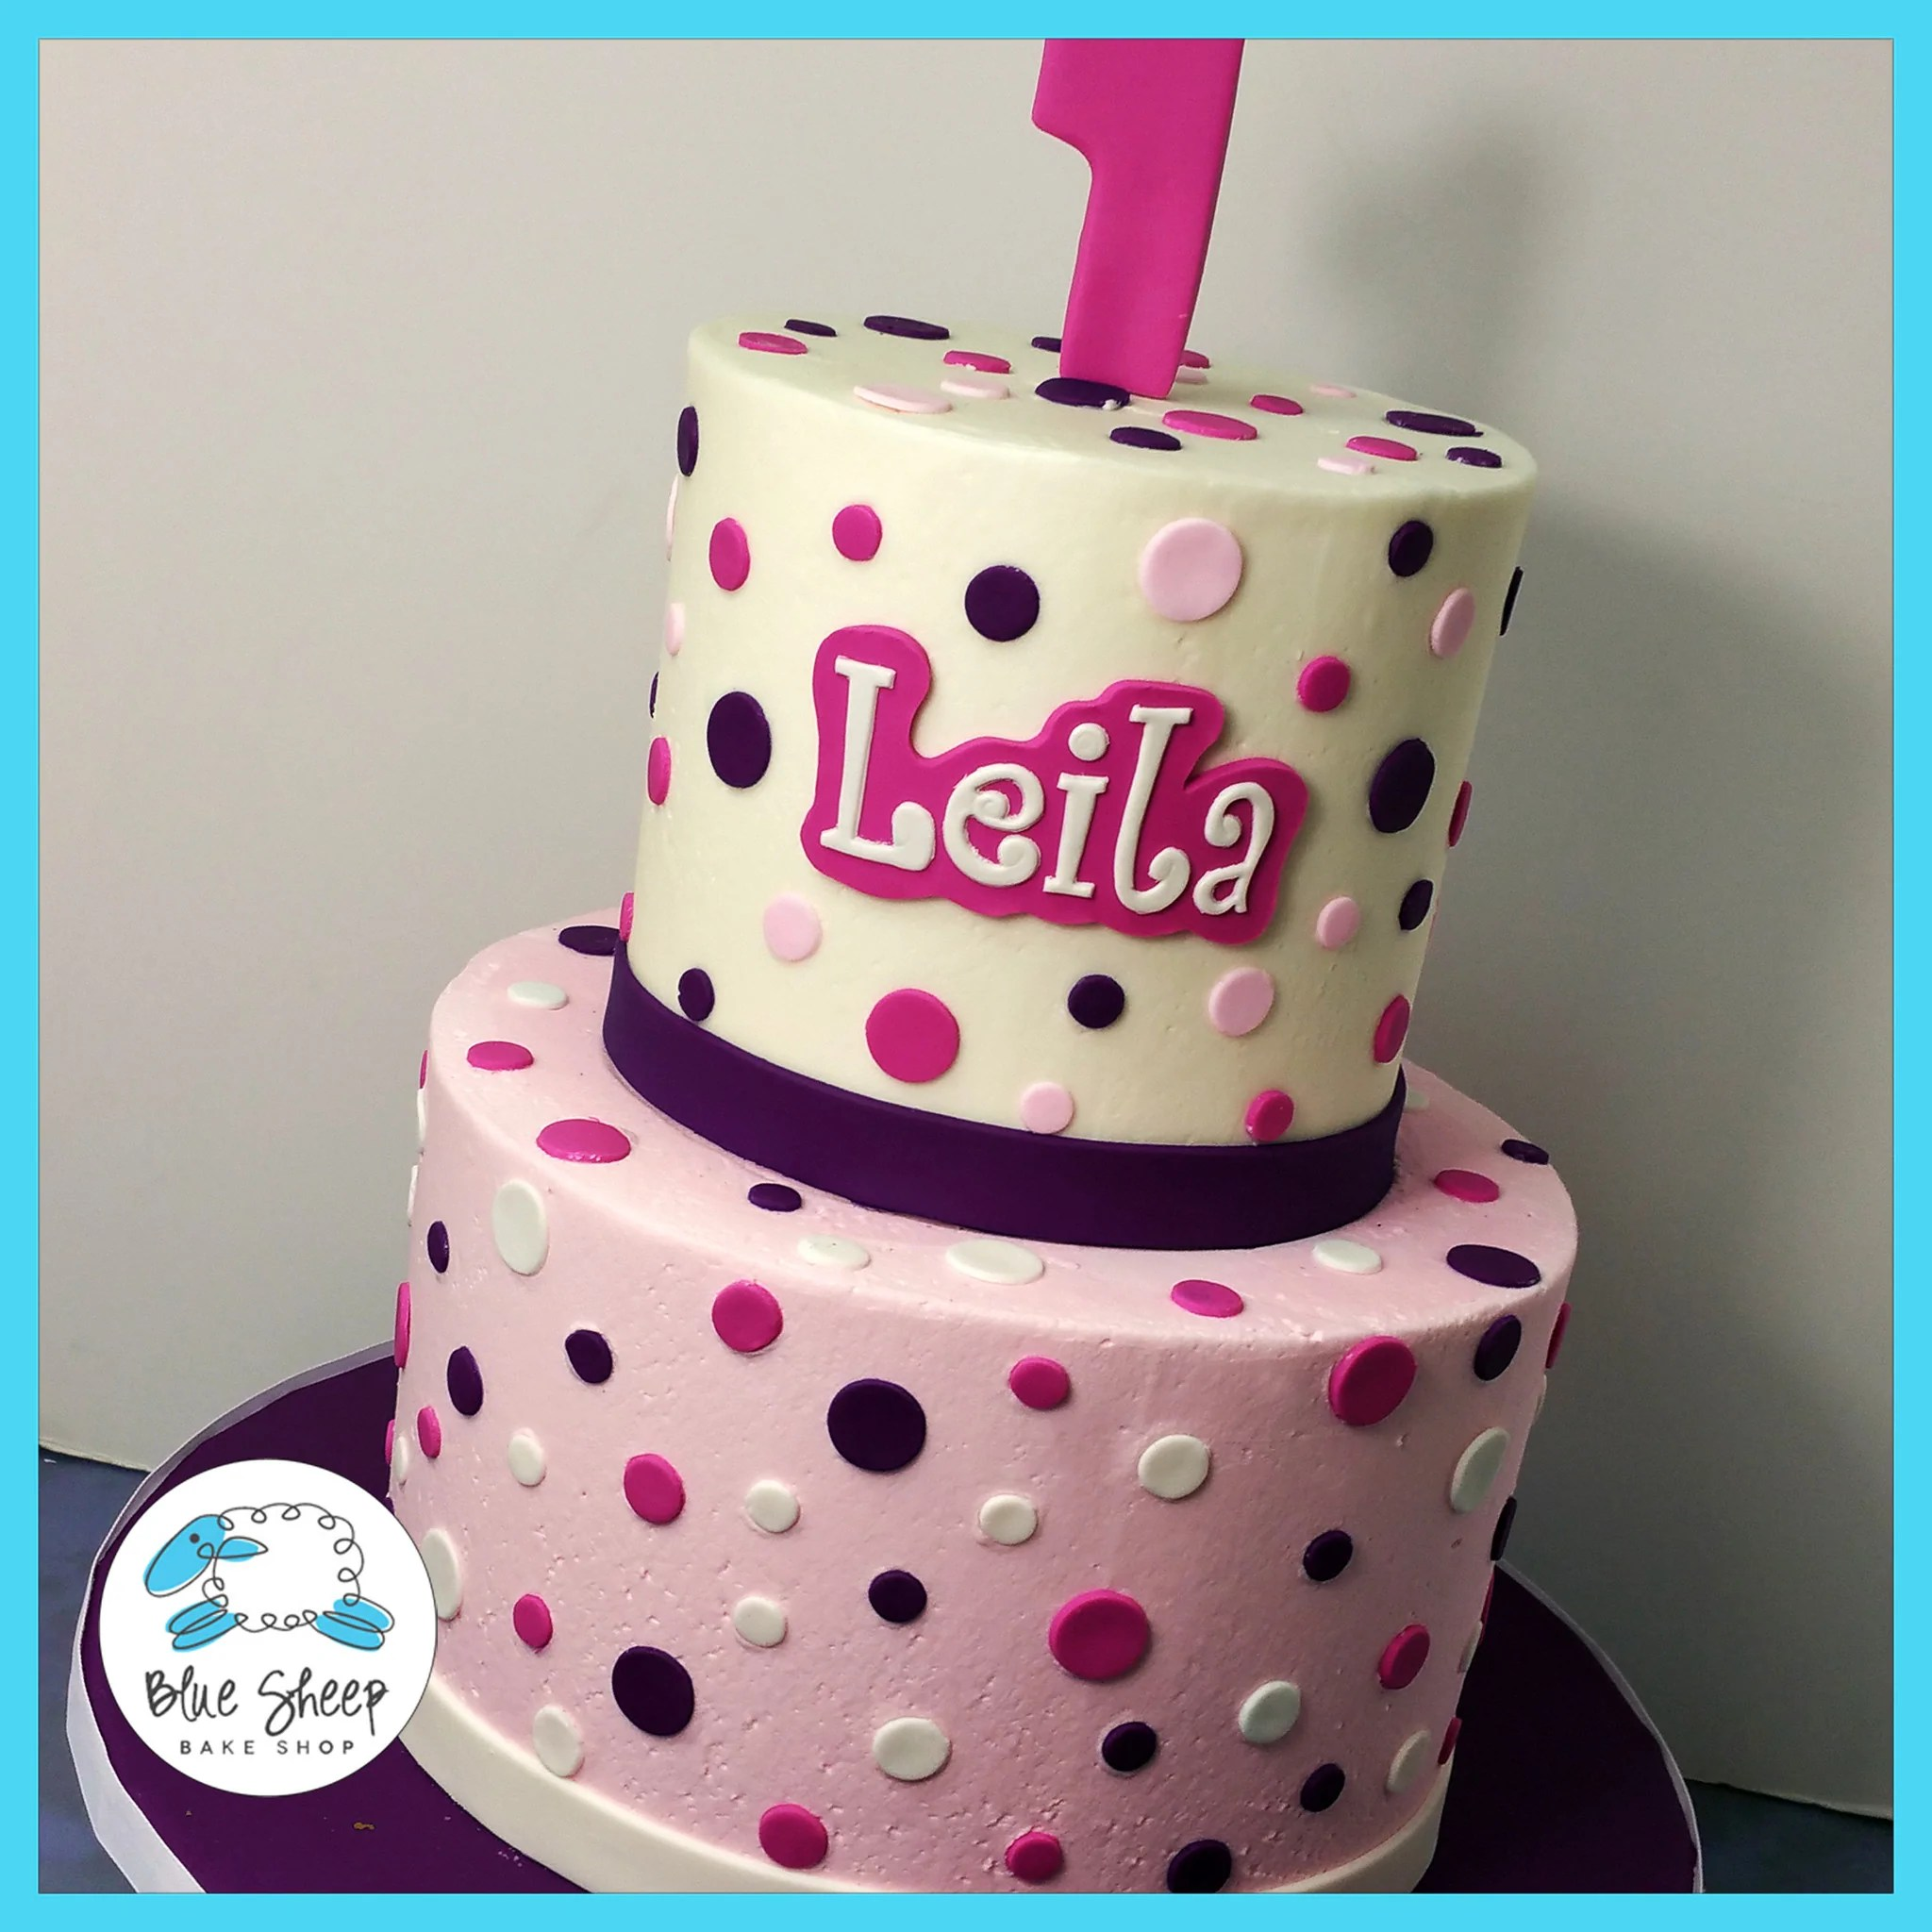 Polka Dot Buttercream Birthday Cake Blue Sheep Bake Shop